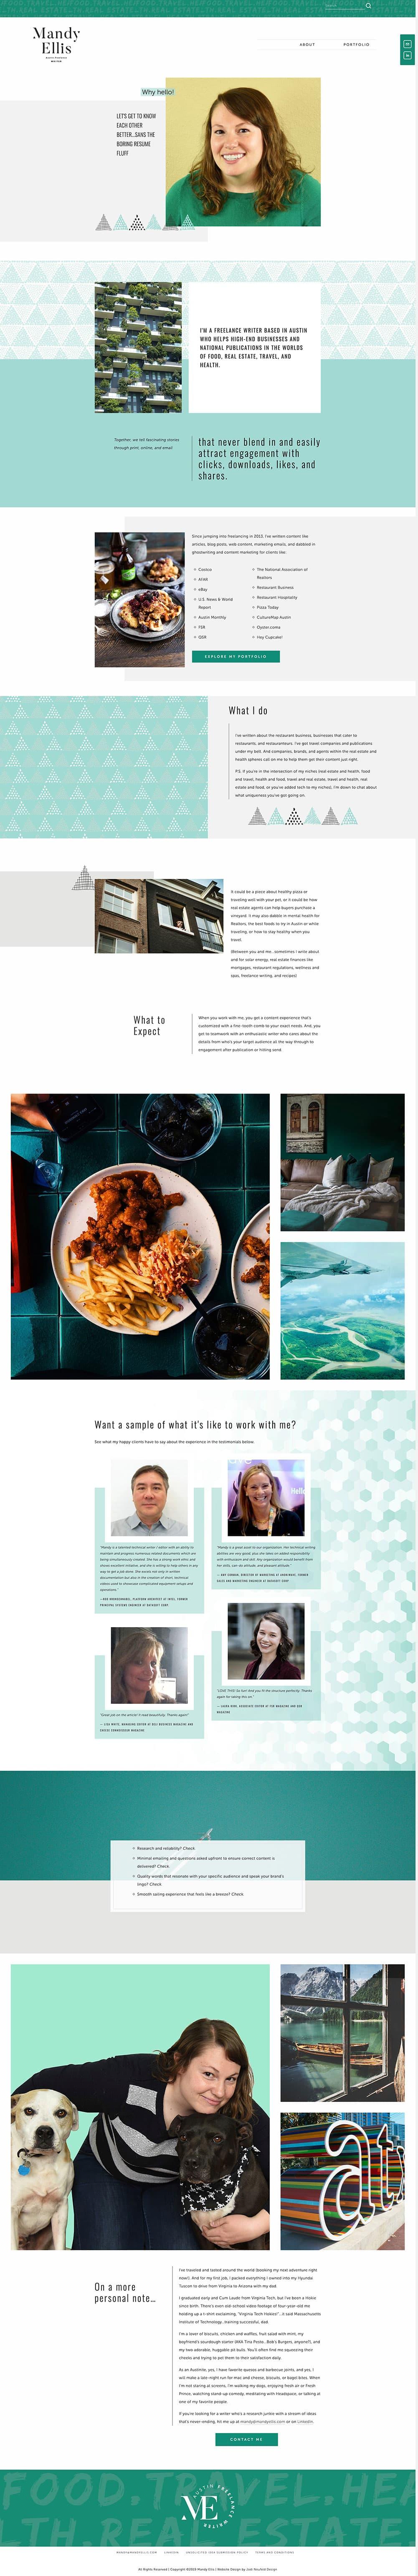 Mandy Ellis freelance writer About page | web design by Jodi Neufeld Design